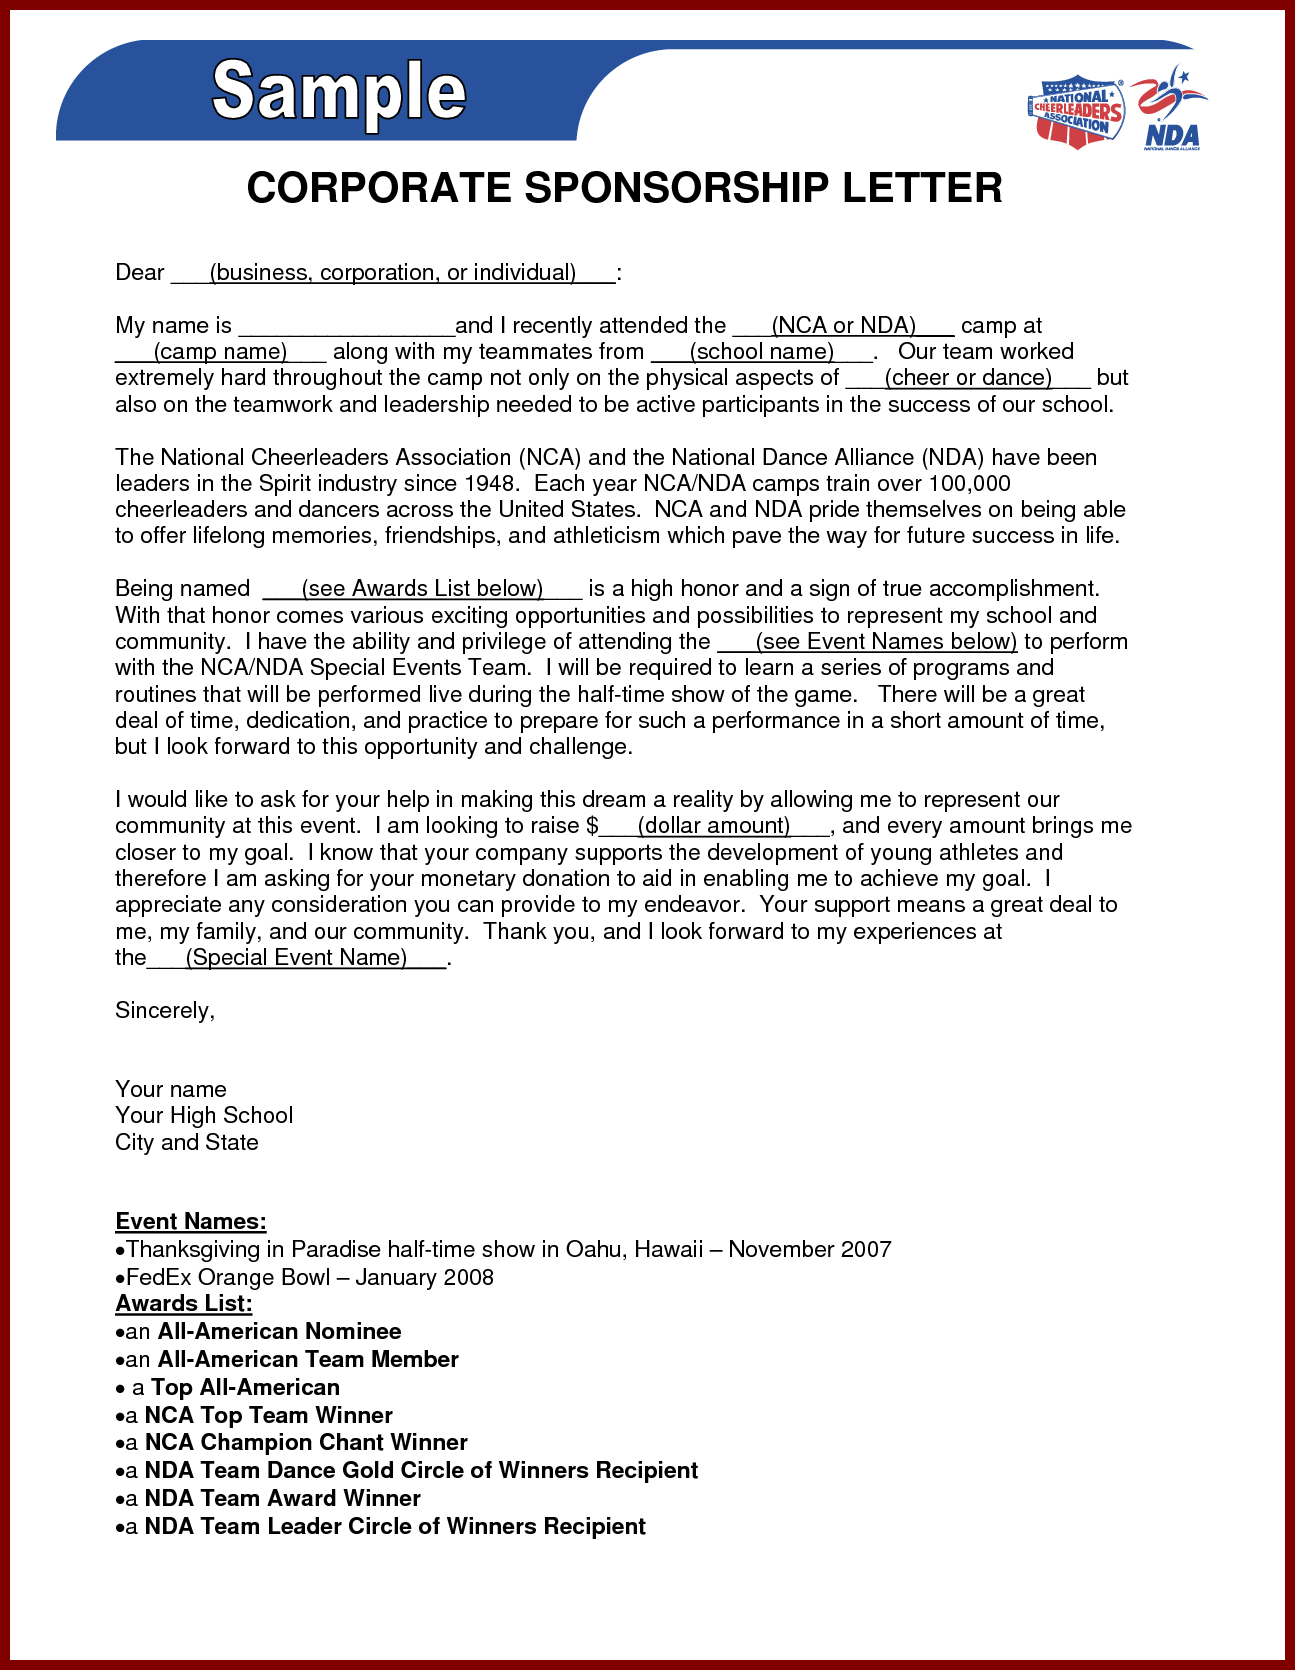 Golf tournament Sponsorship Letter Template - Business Sponsorship Letter Template Gallery Business Cards Ideas